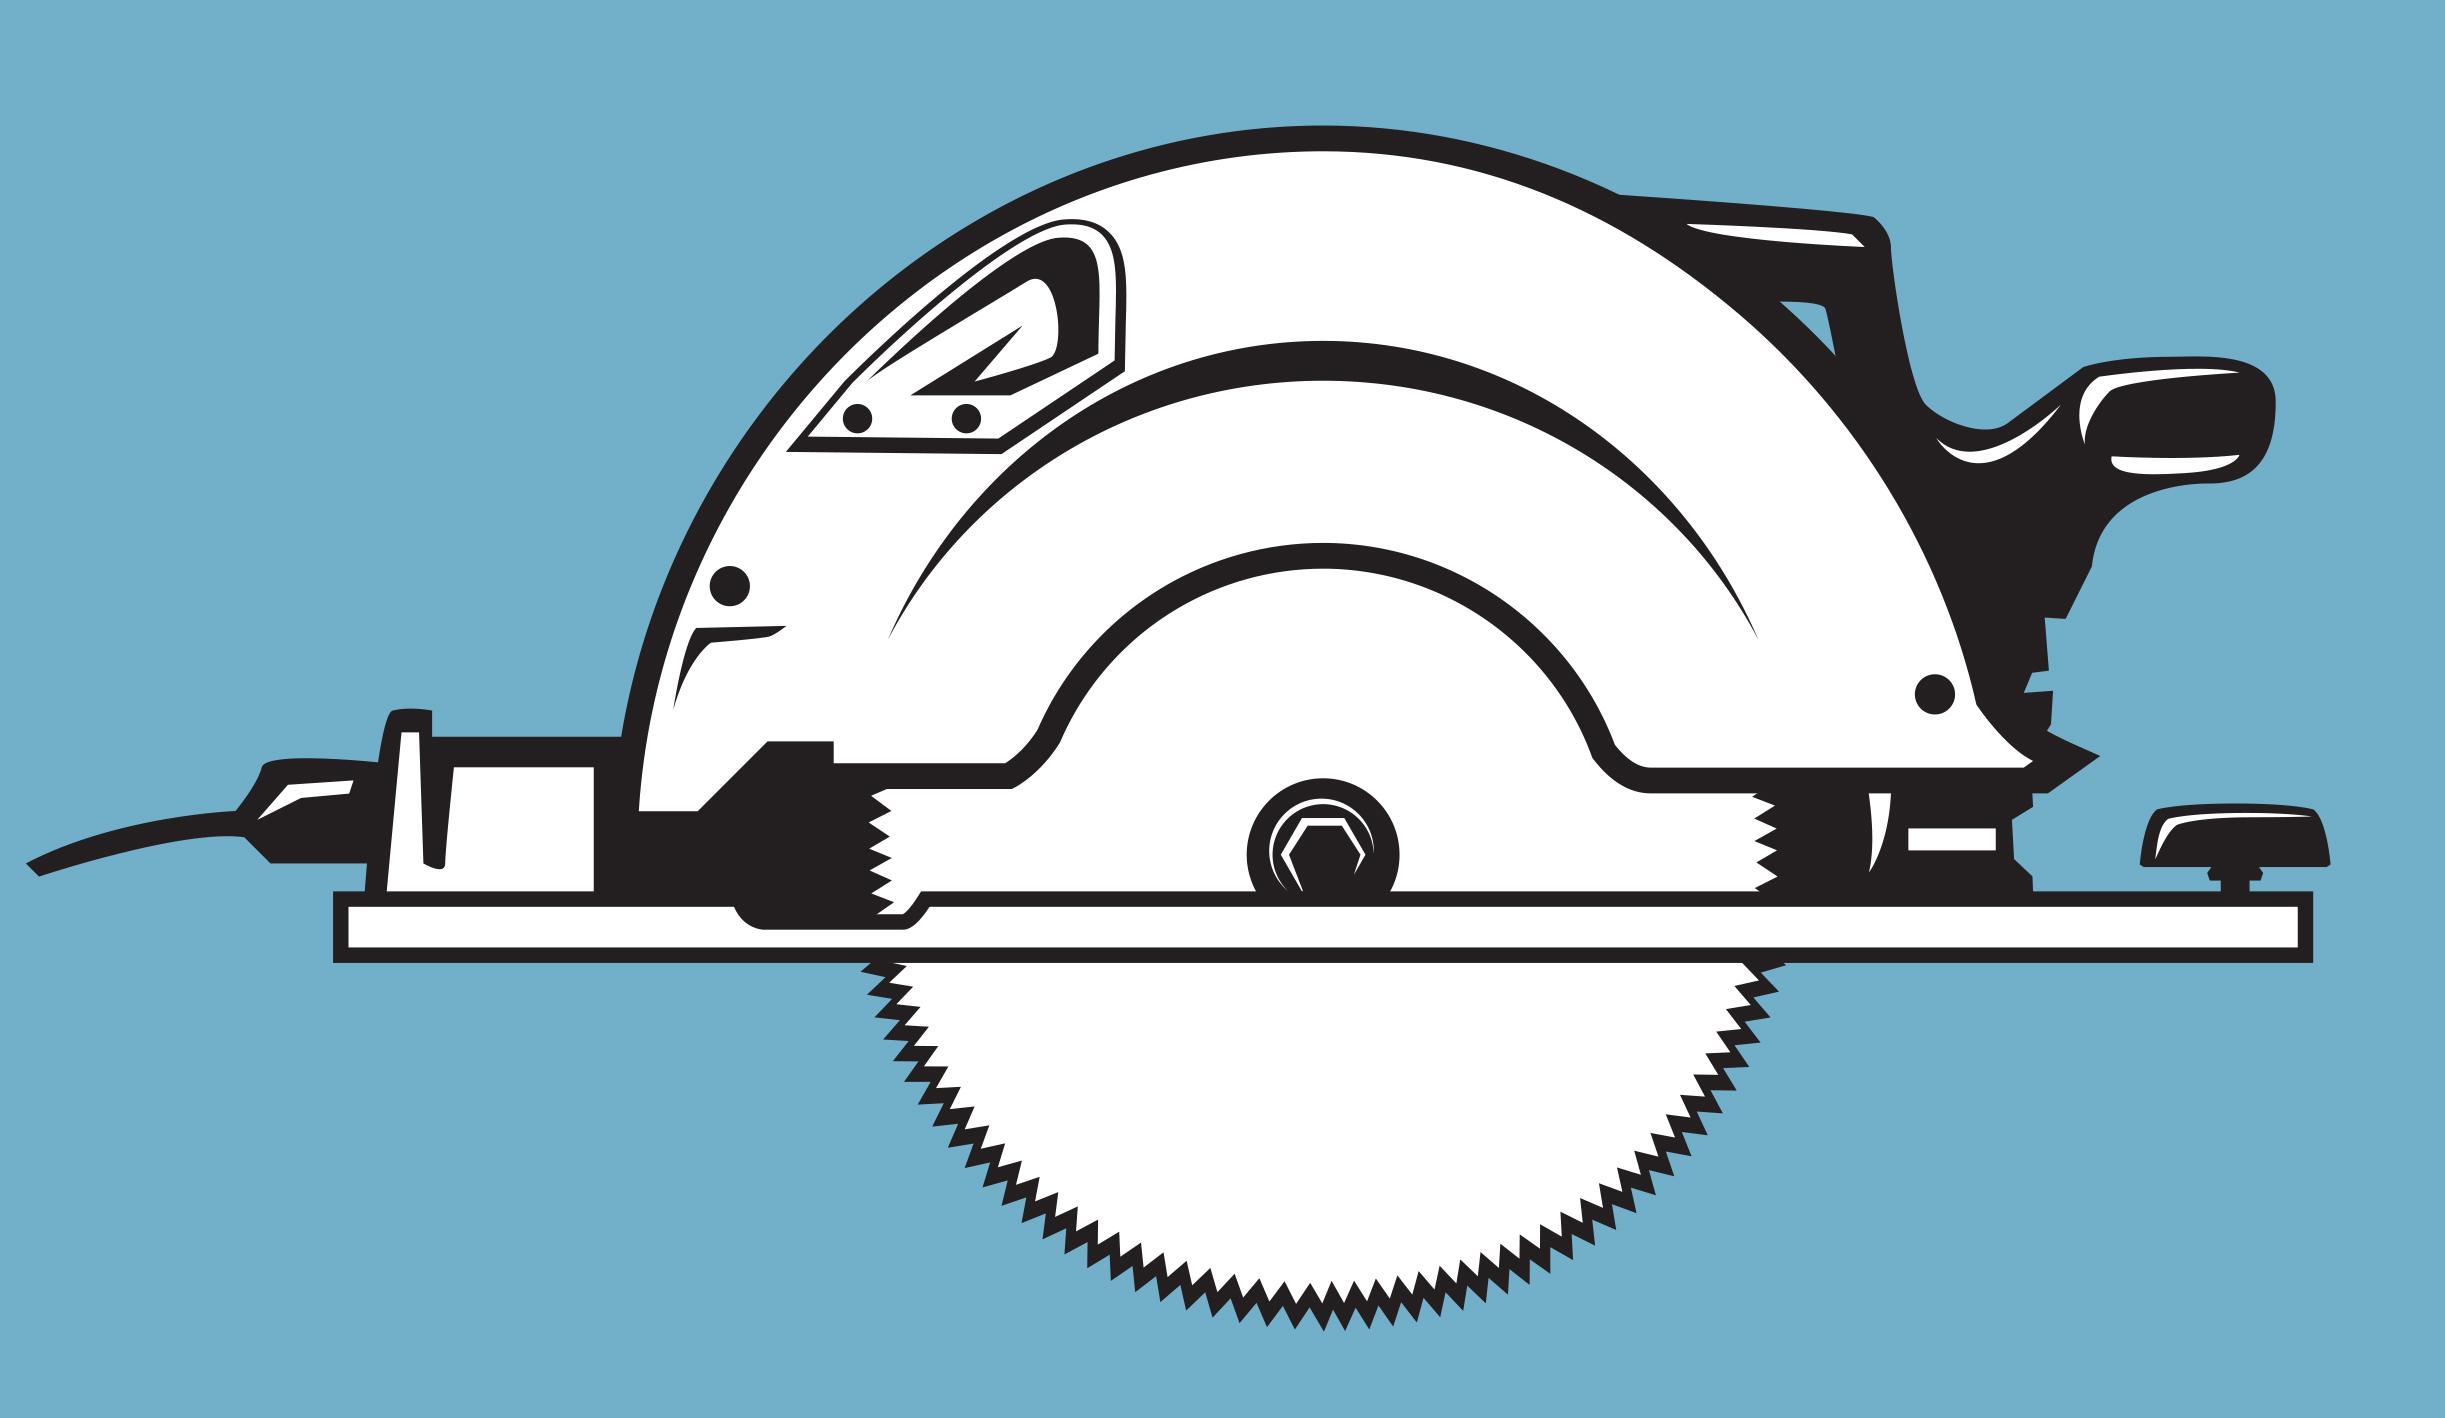 Circular Saw Line Art